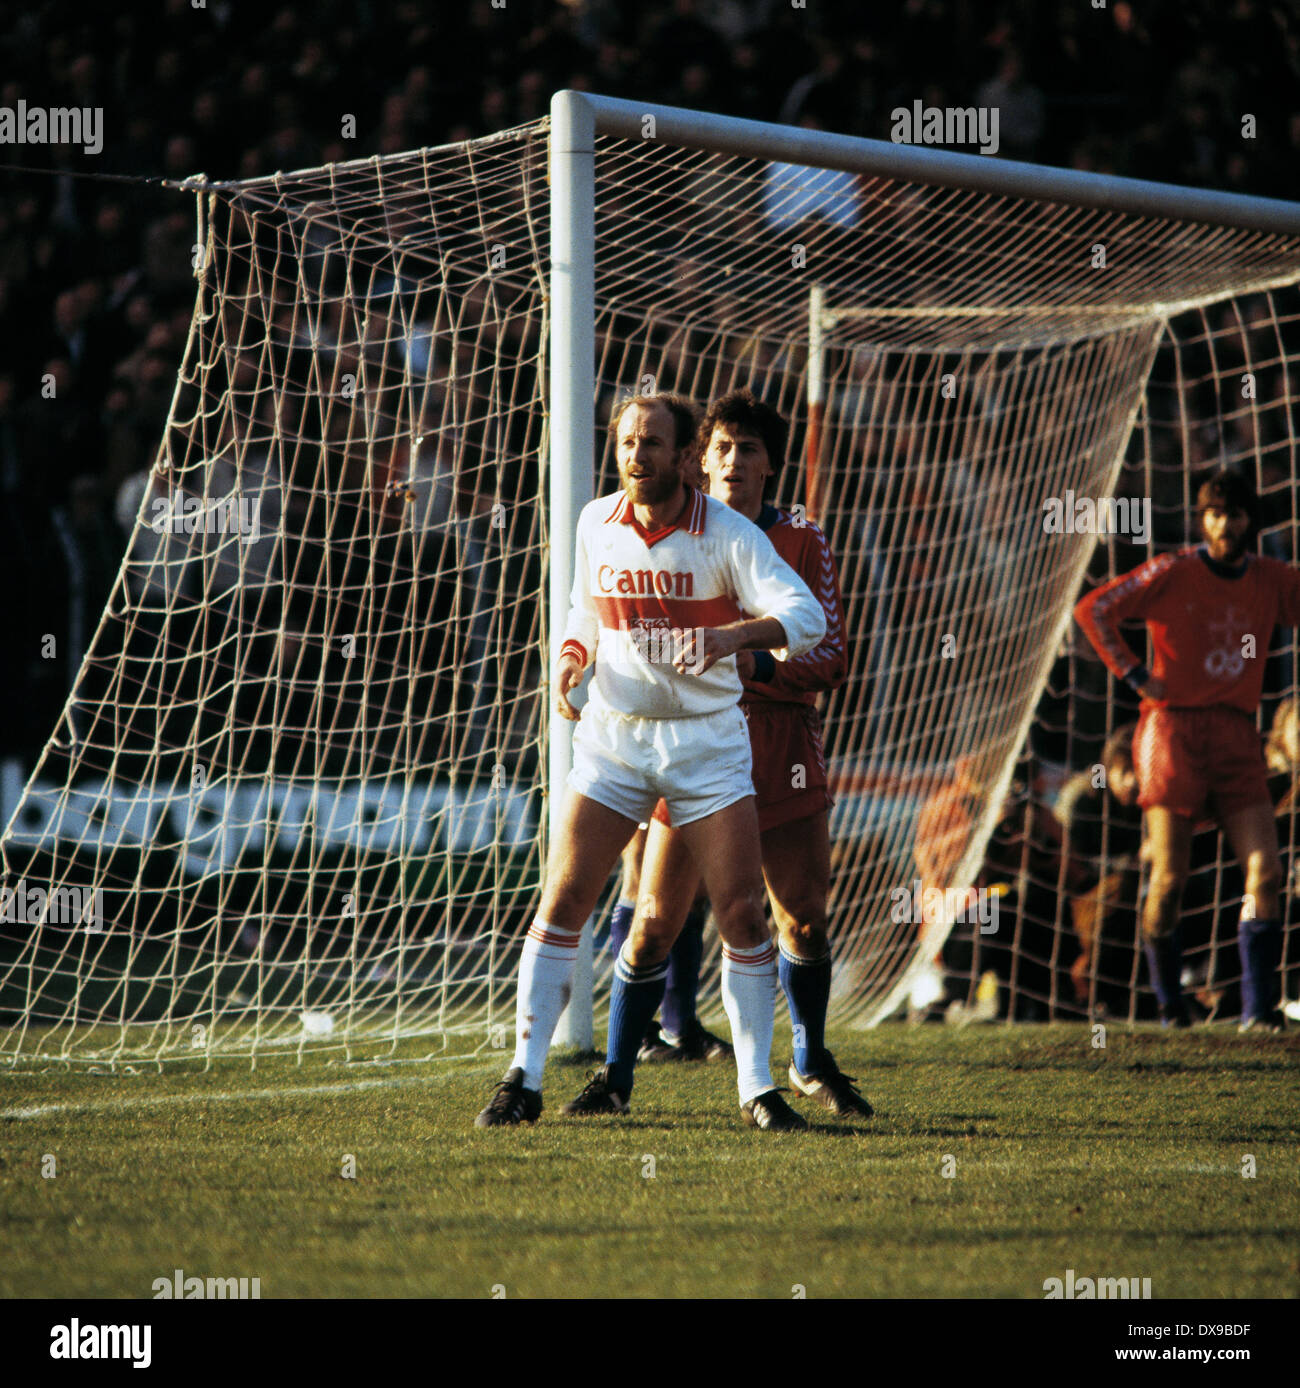 football, Bundesliga, 1979/1980, Grotenburg Stadium, FC Bayer 05 Uerdingen versus VfB Stuttgart 4:2, scene of the match, goal box scene, Erwin Hadewicz (Stuttgart) left and Franz Raschid (Uerdingen) - Stock Image